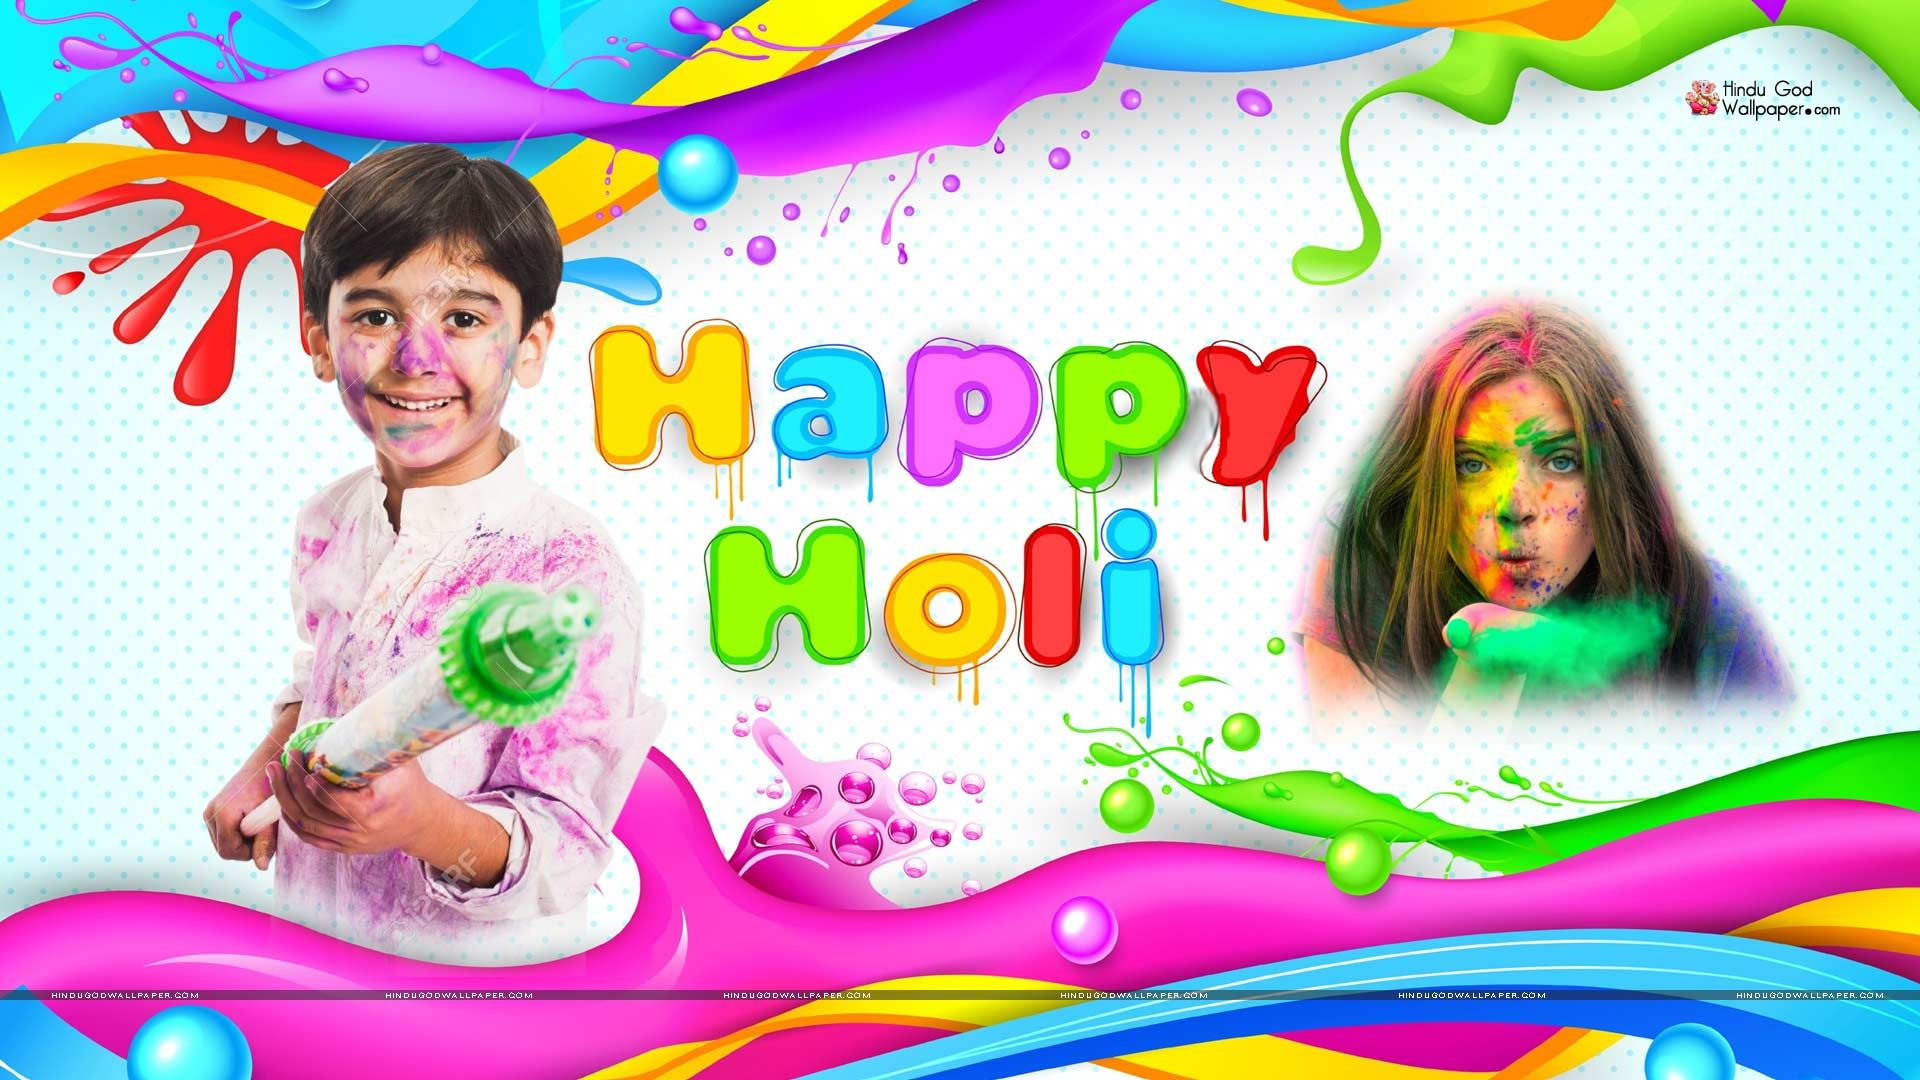 Happy Holi Hd Wallpaper 1080p Holi Wallpapers In 2019 Happy Holi